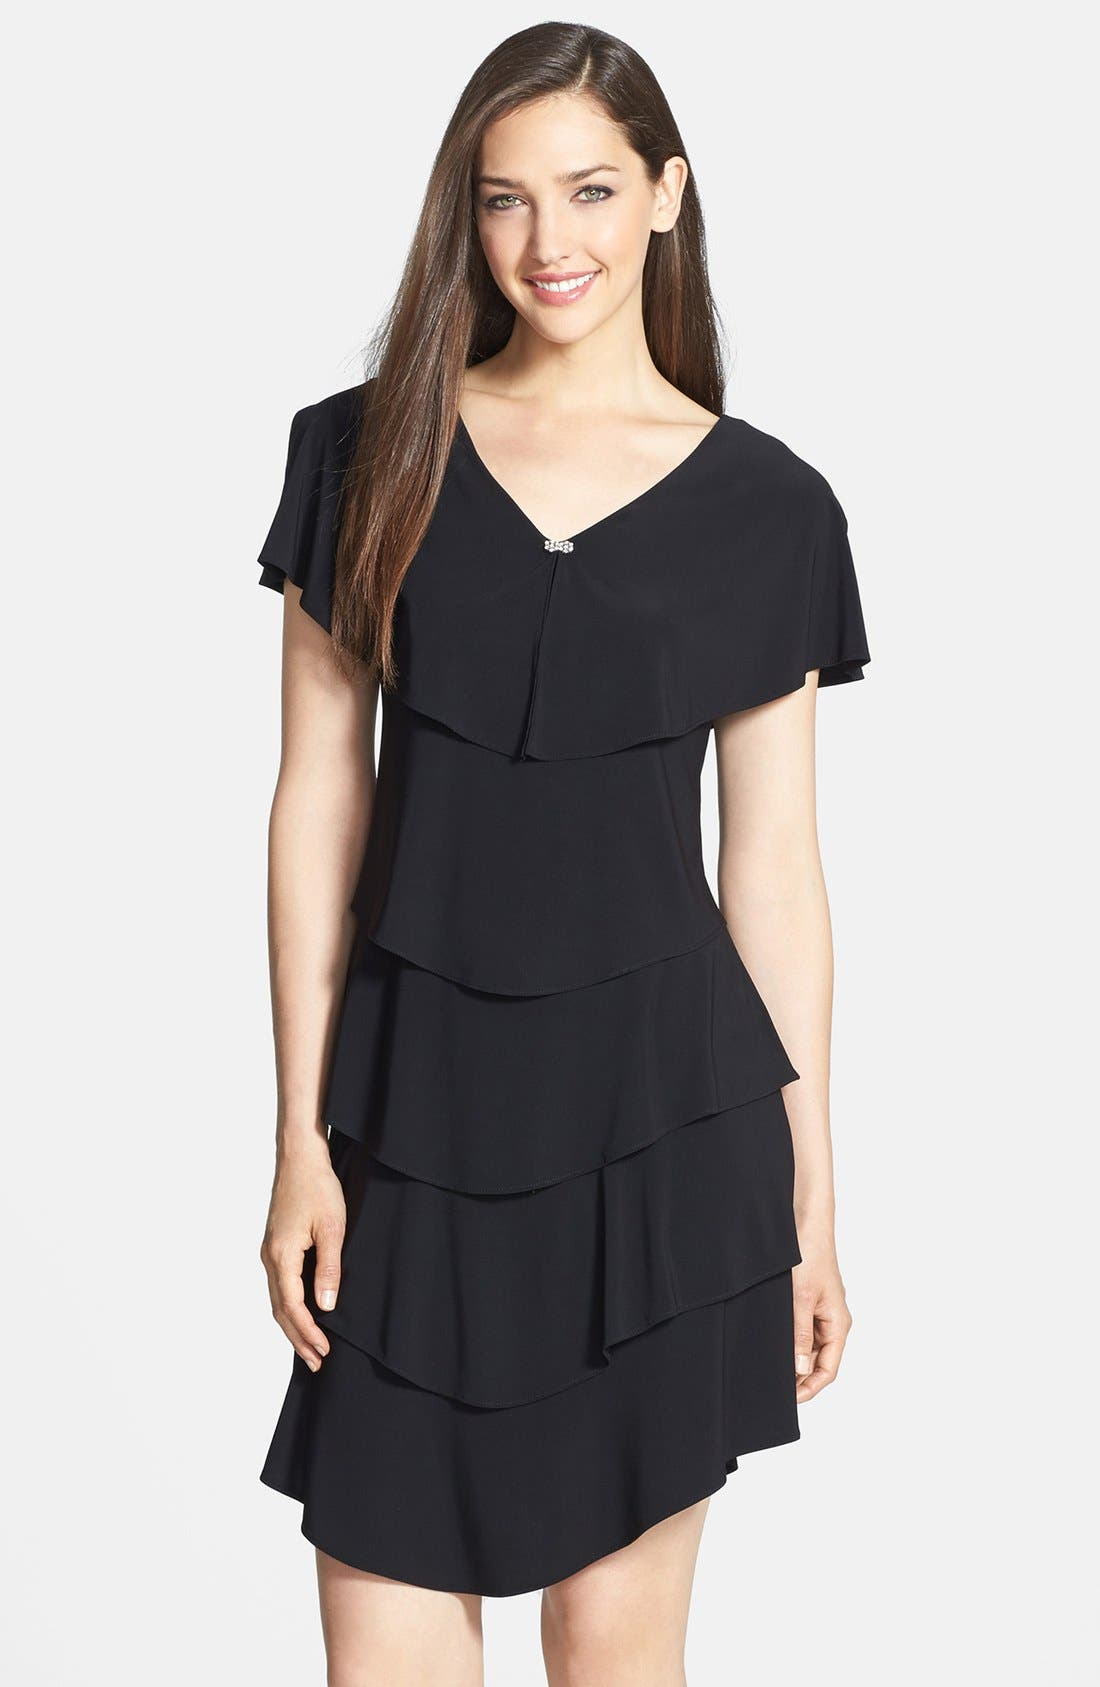 Alternate Image 1 Selected - Patra Embellished Tiered Jersey Dress